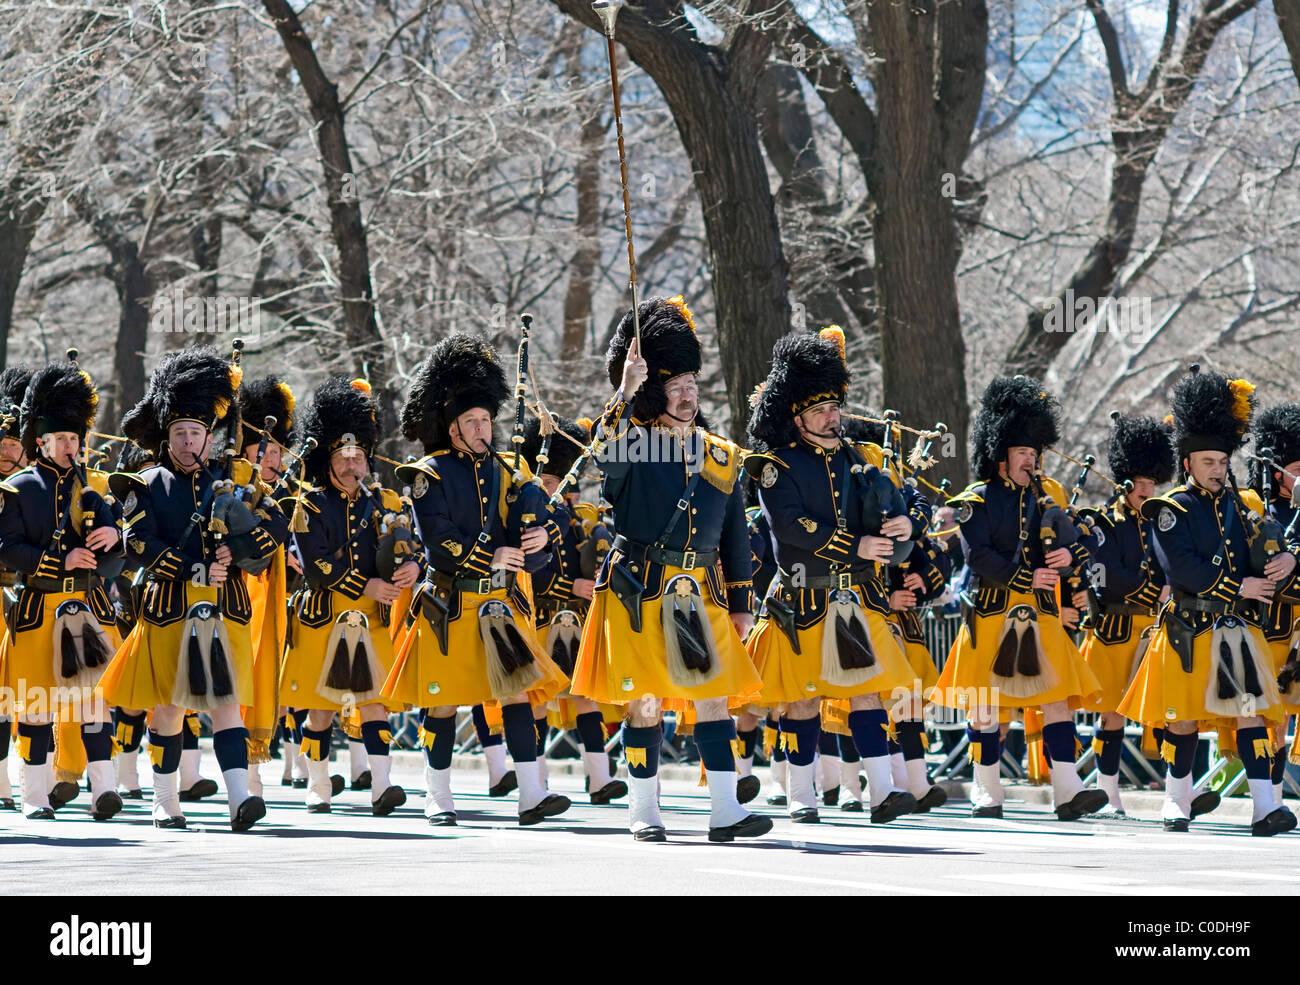 Dudelsackspieler am St. Patricks Day Parade auf der Fifth Avenue in New York City. Stockbild